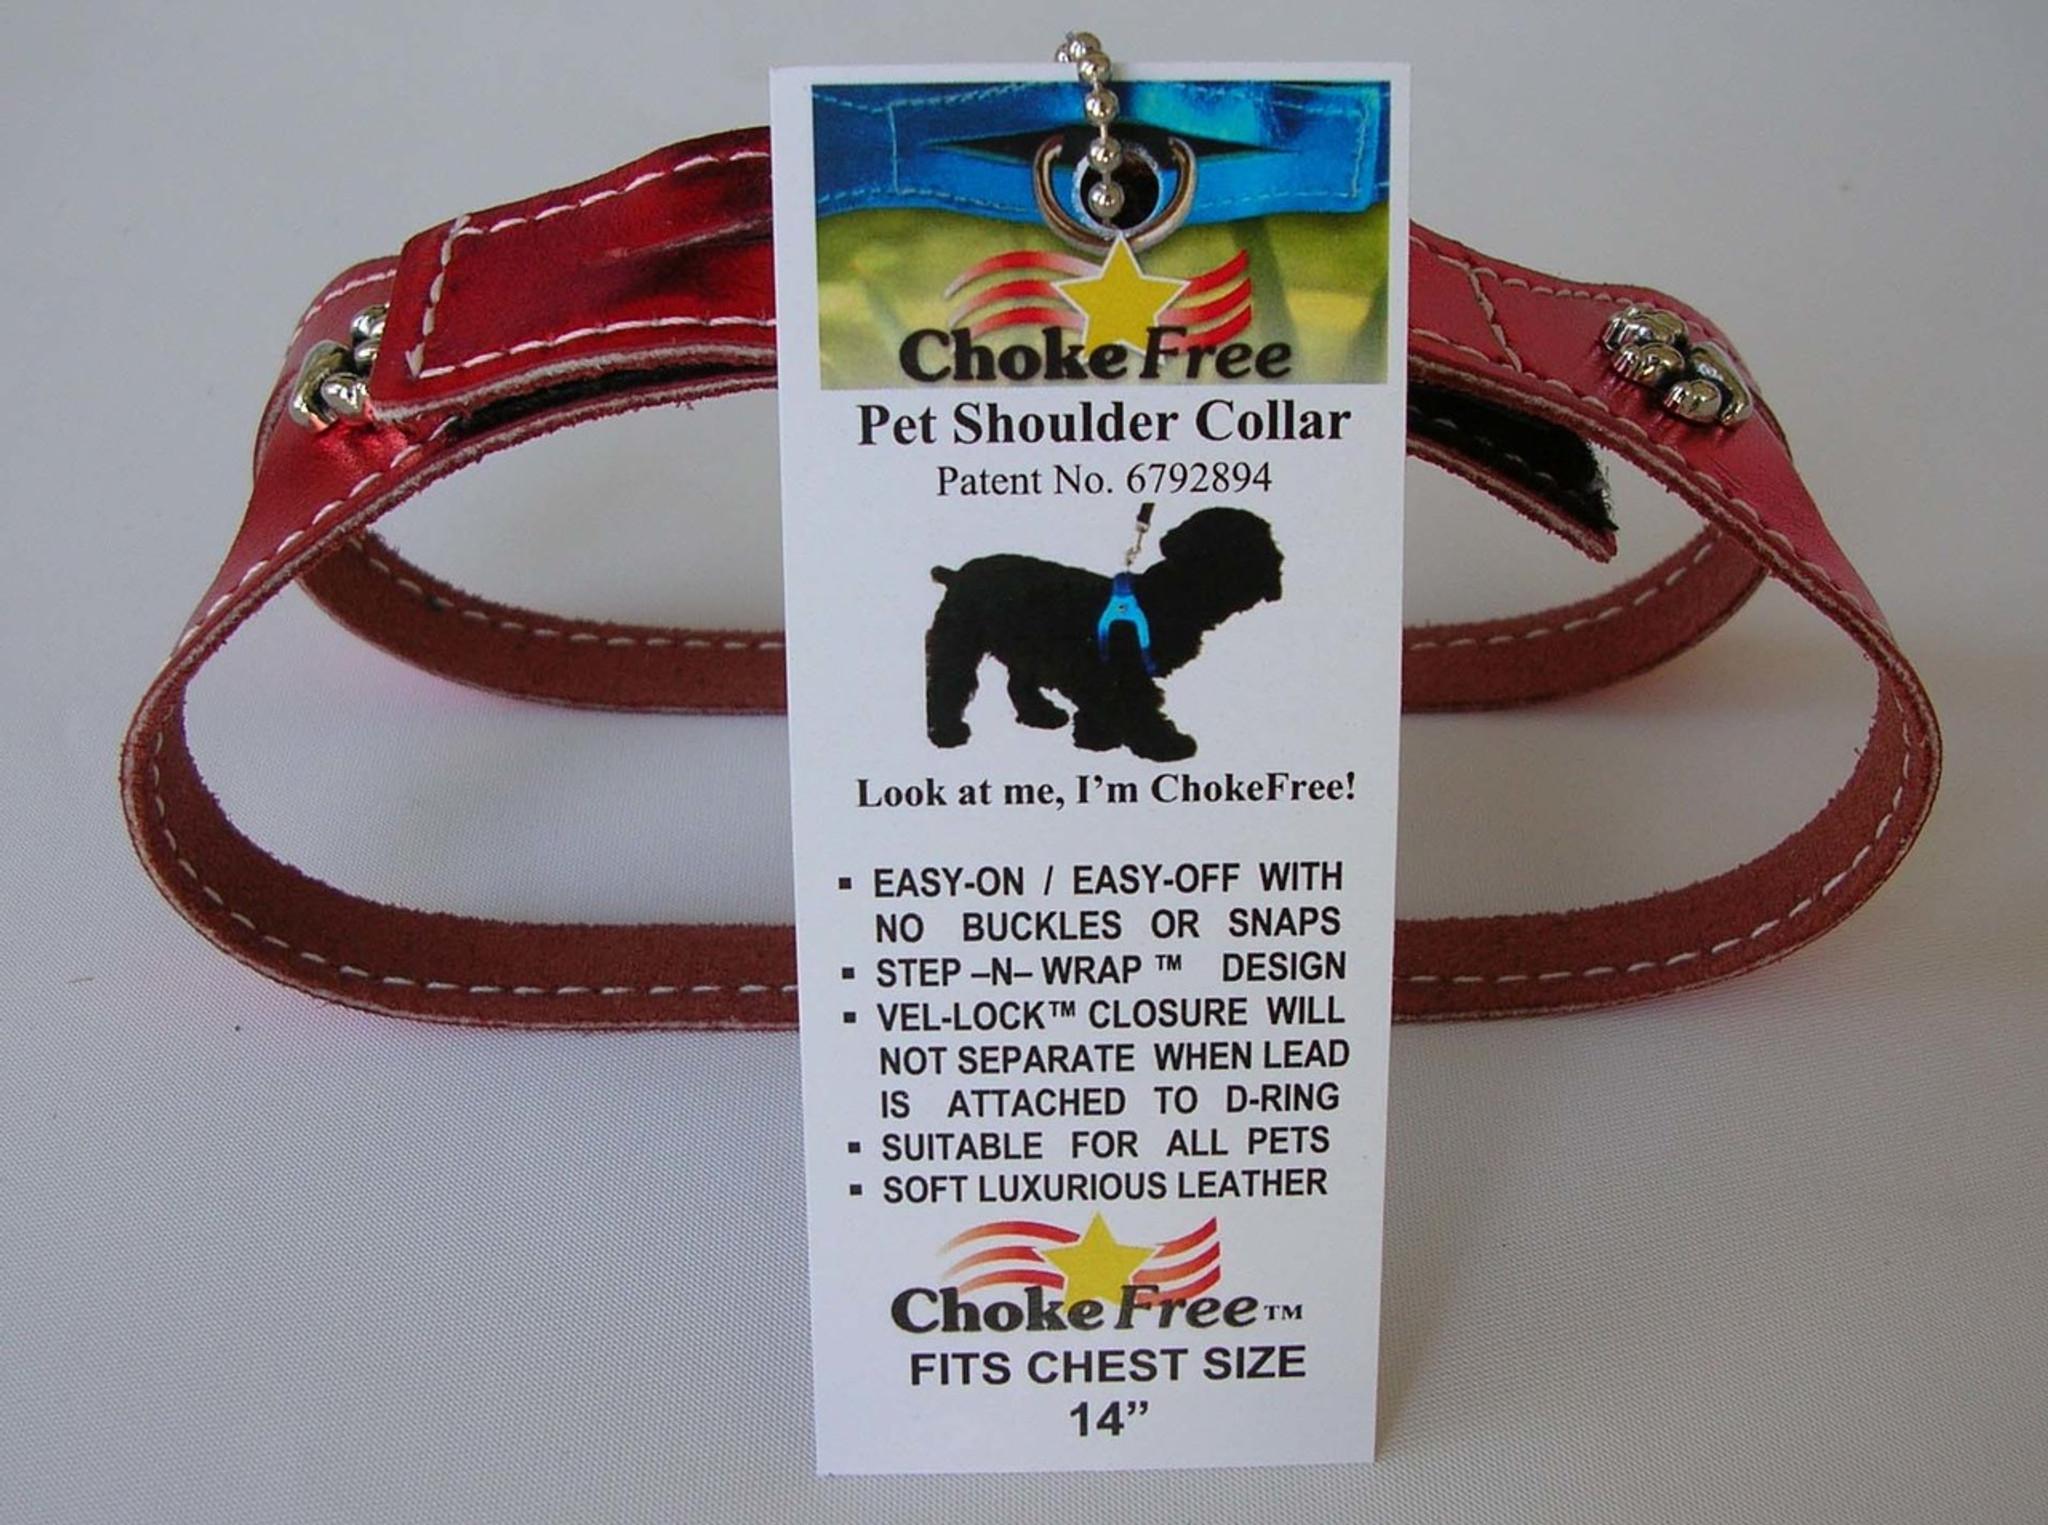 chokefree non metallic leather shoulder collars harness puttin